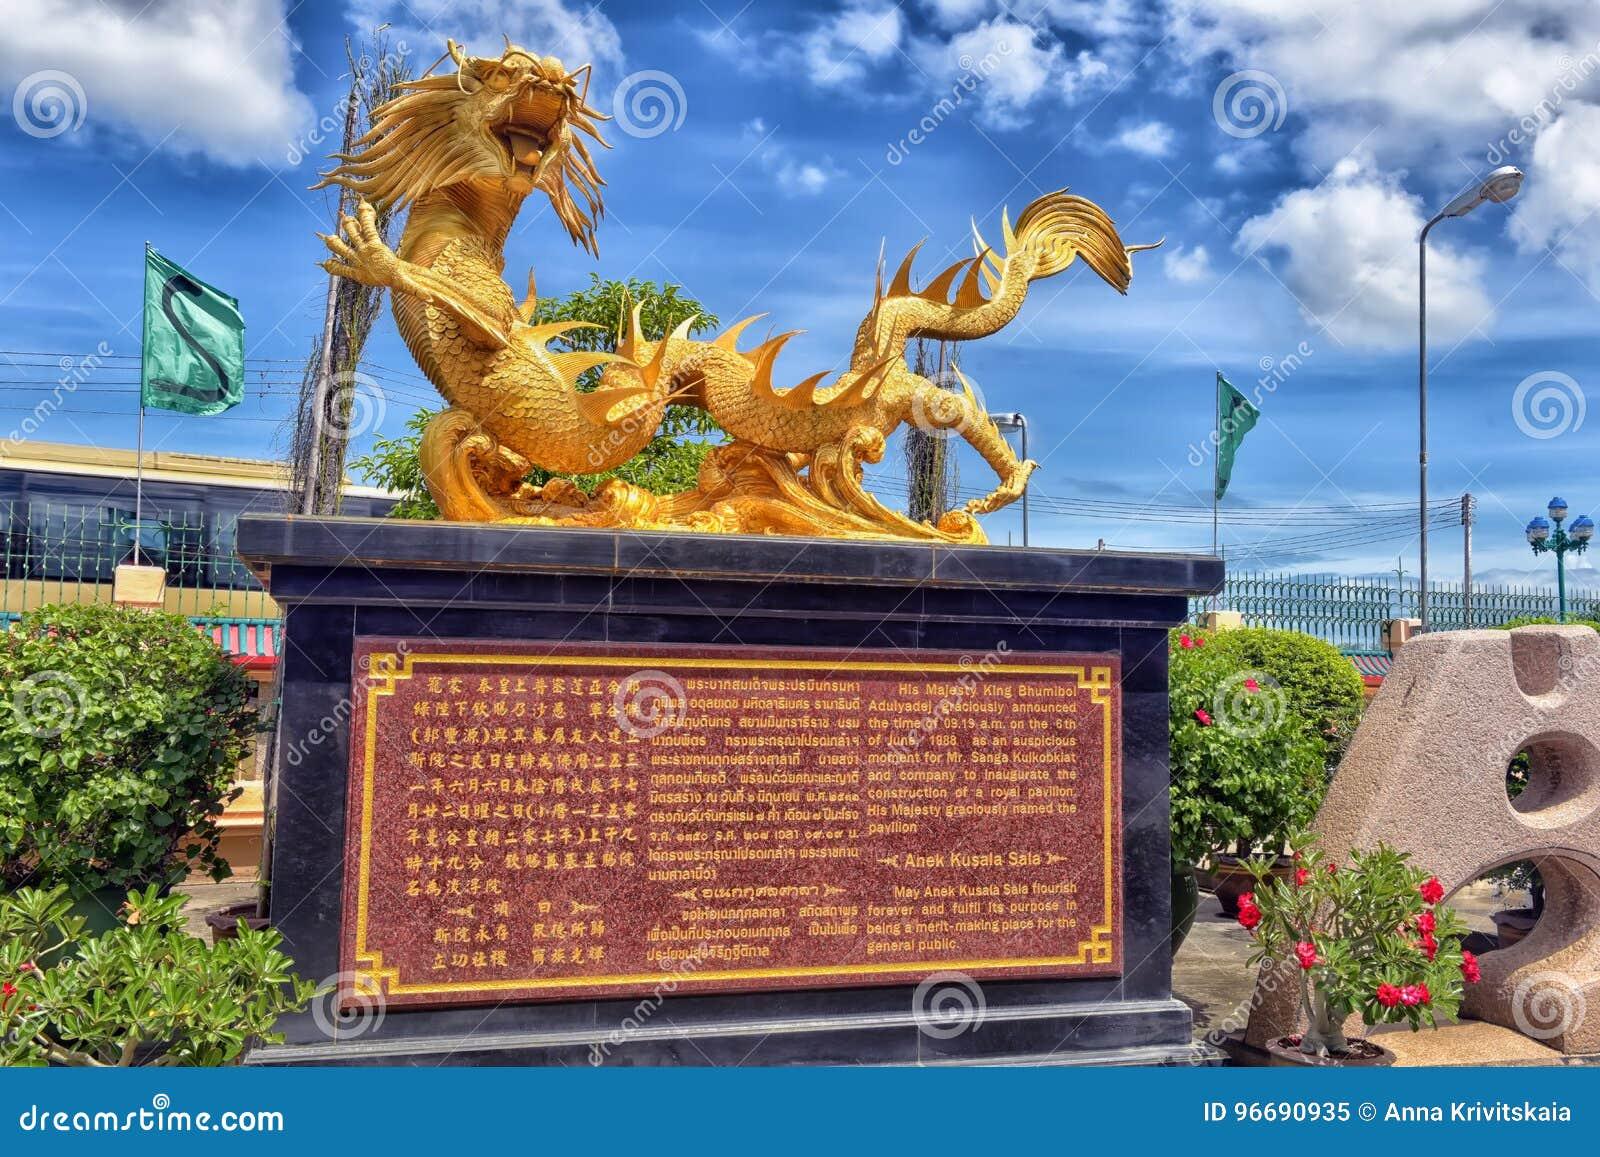 Beautiful Chinese dragons sculpture at Anek Kusala Sala Viharn Sien Chinese temple in Pattaya,